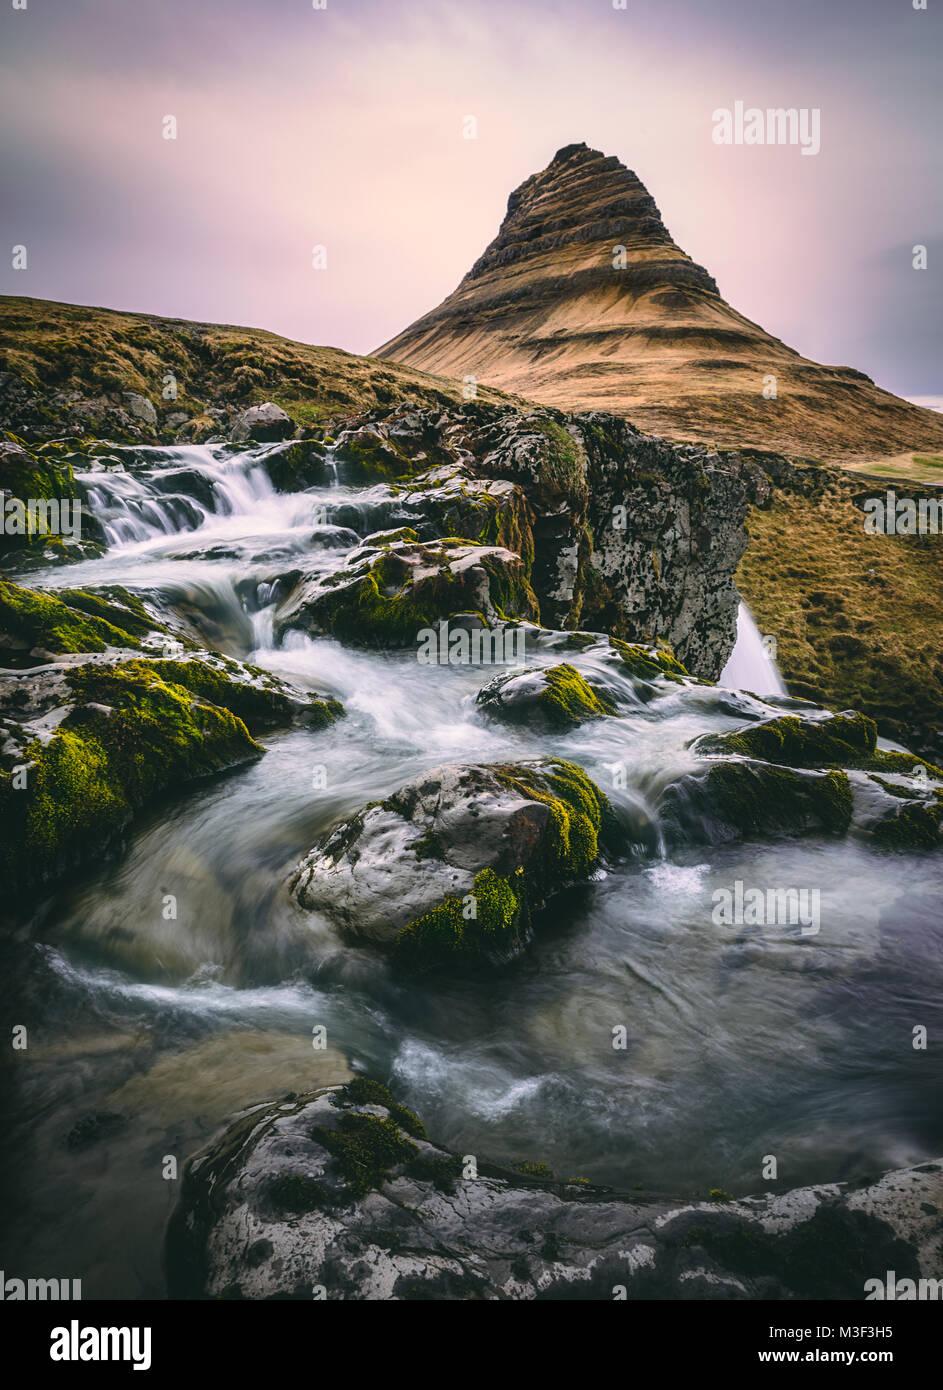 Kirkjufellsfoss - Iceland - Stock Image